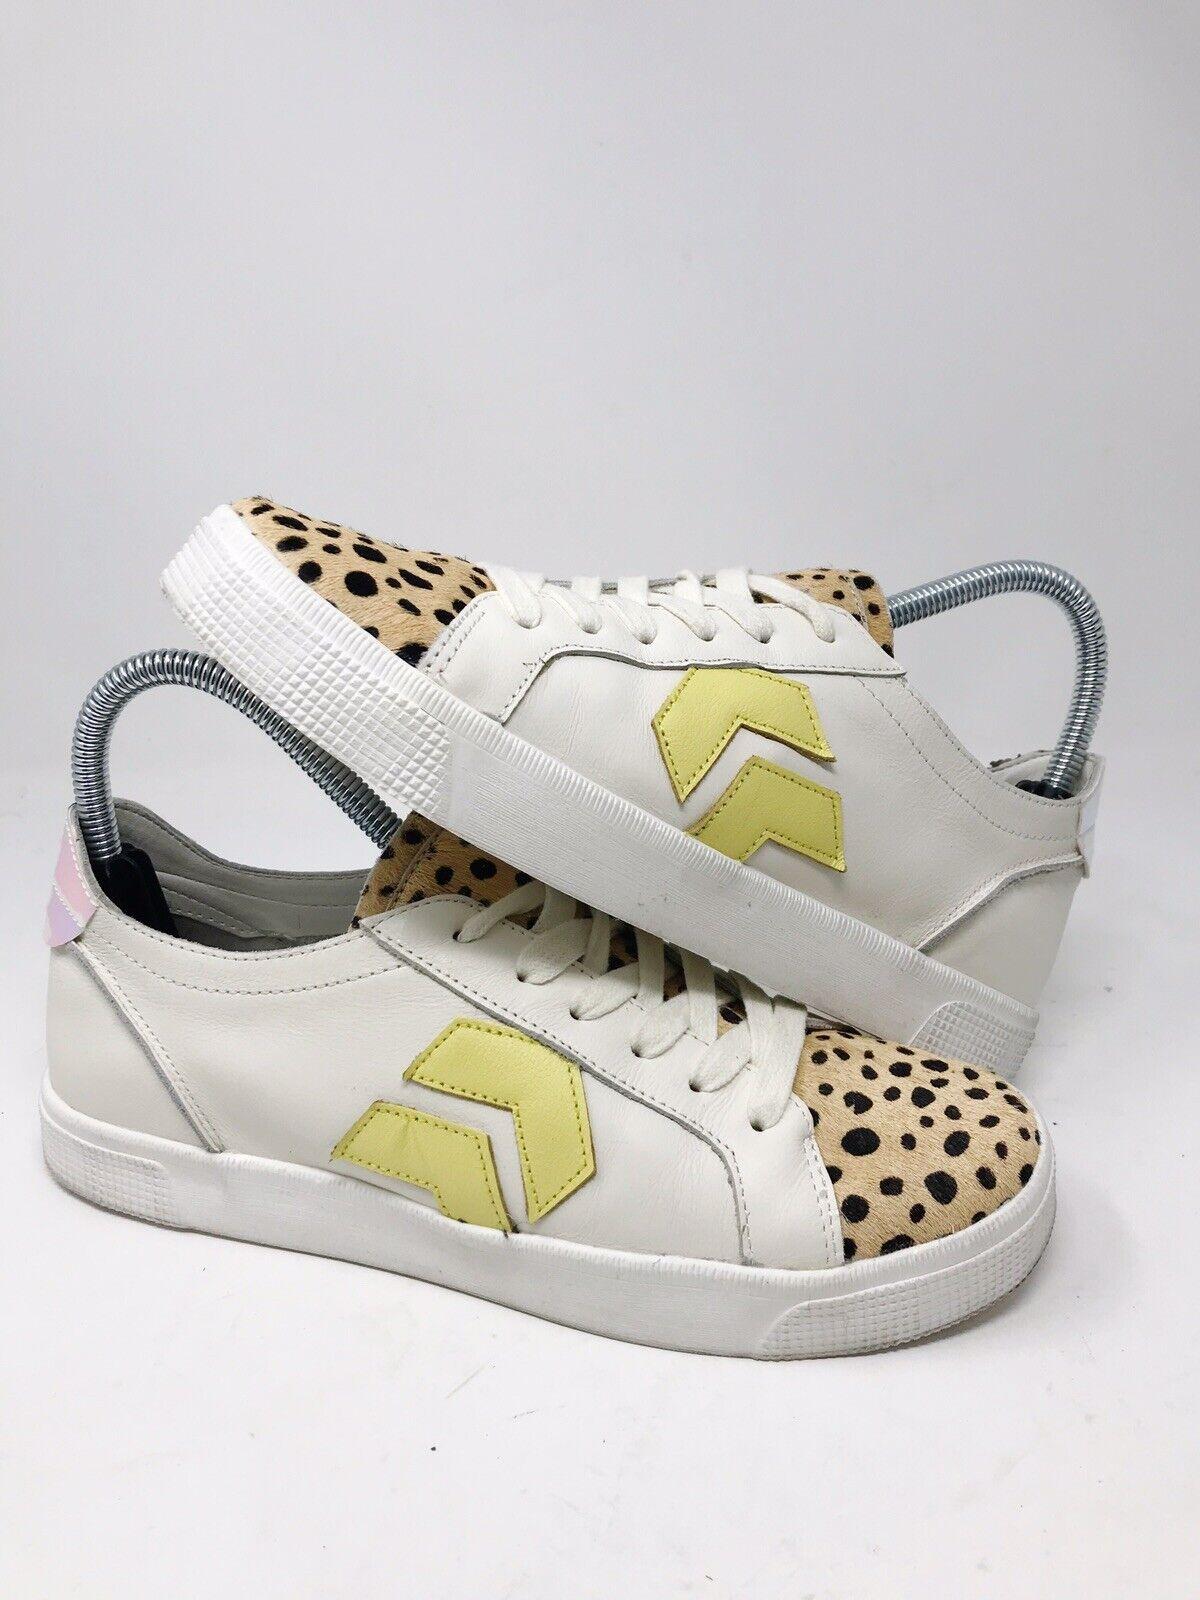 Dolce Vita Women's Zeph Leopard Cheetah Calf Hair Sz 7.5 Leather Sneakers Shoes